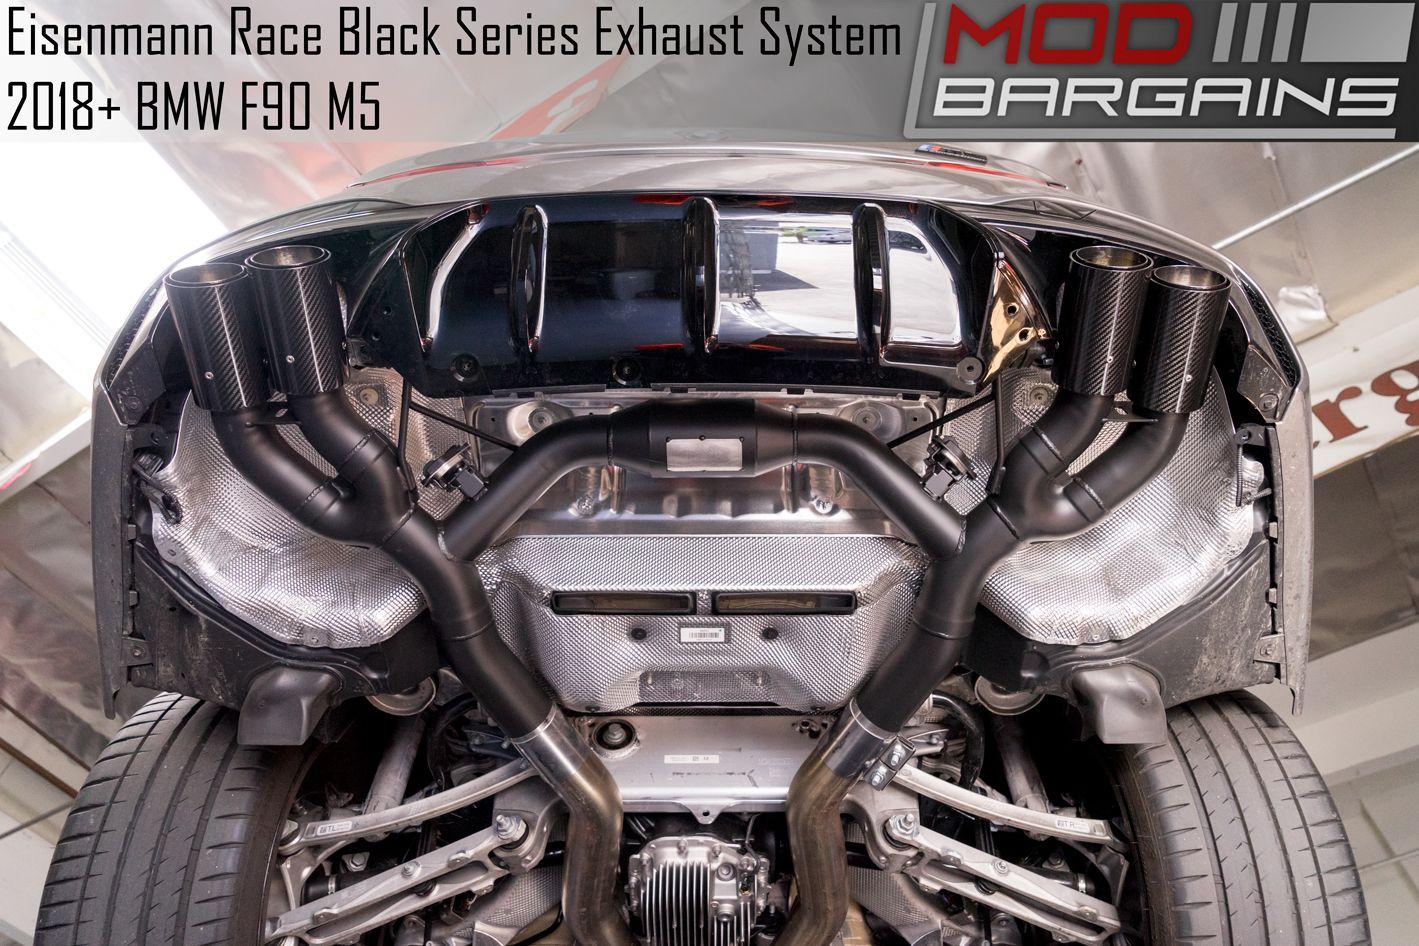 BMW F90 M5 Eisenmann Exhaust Black Series Weight Savings